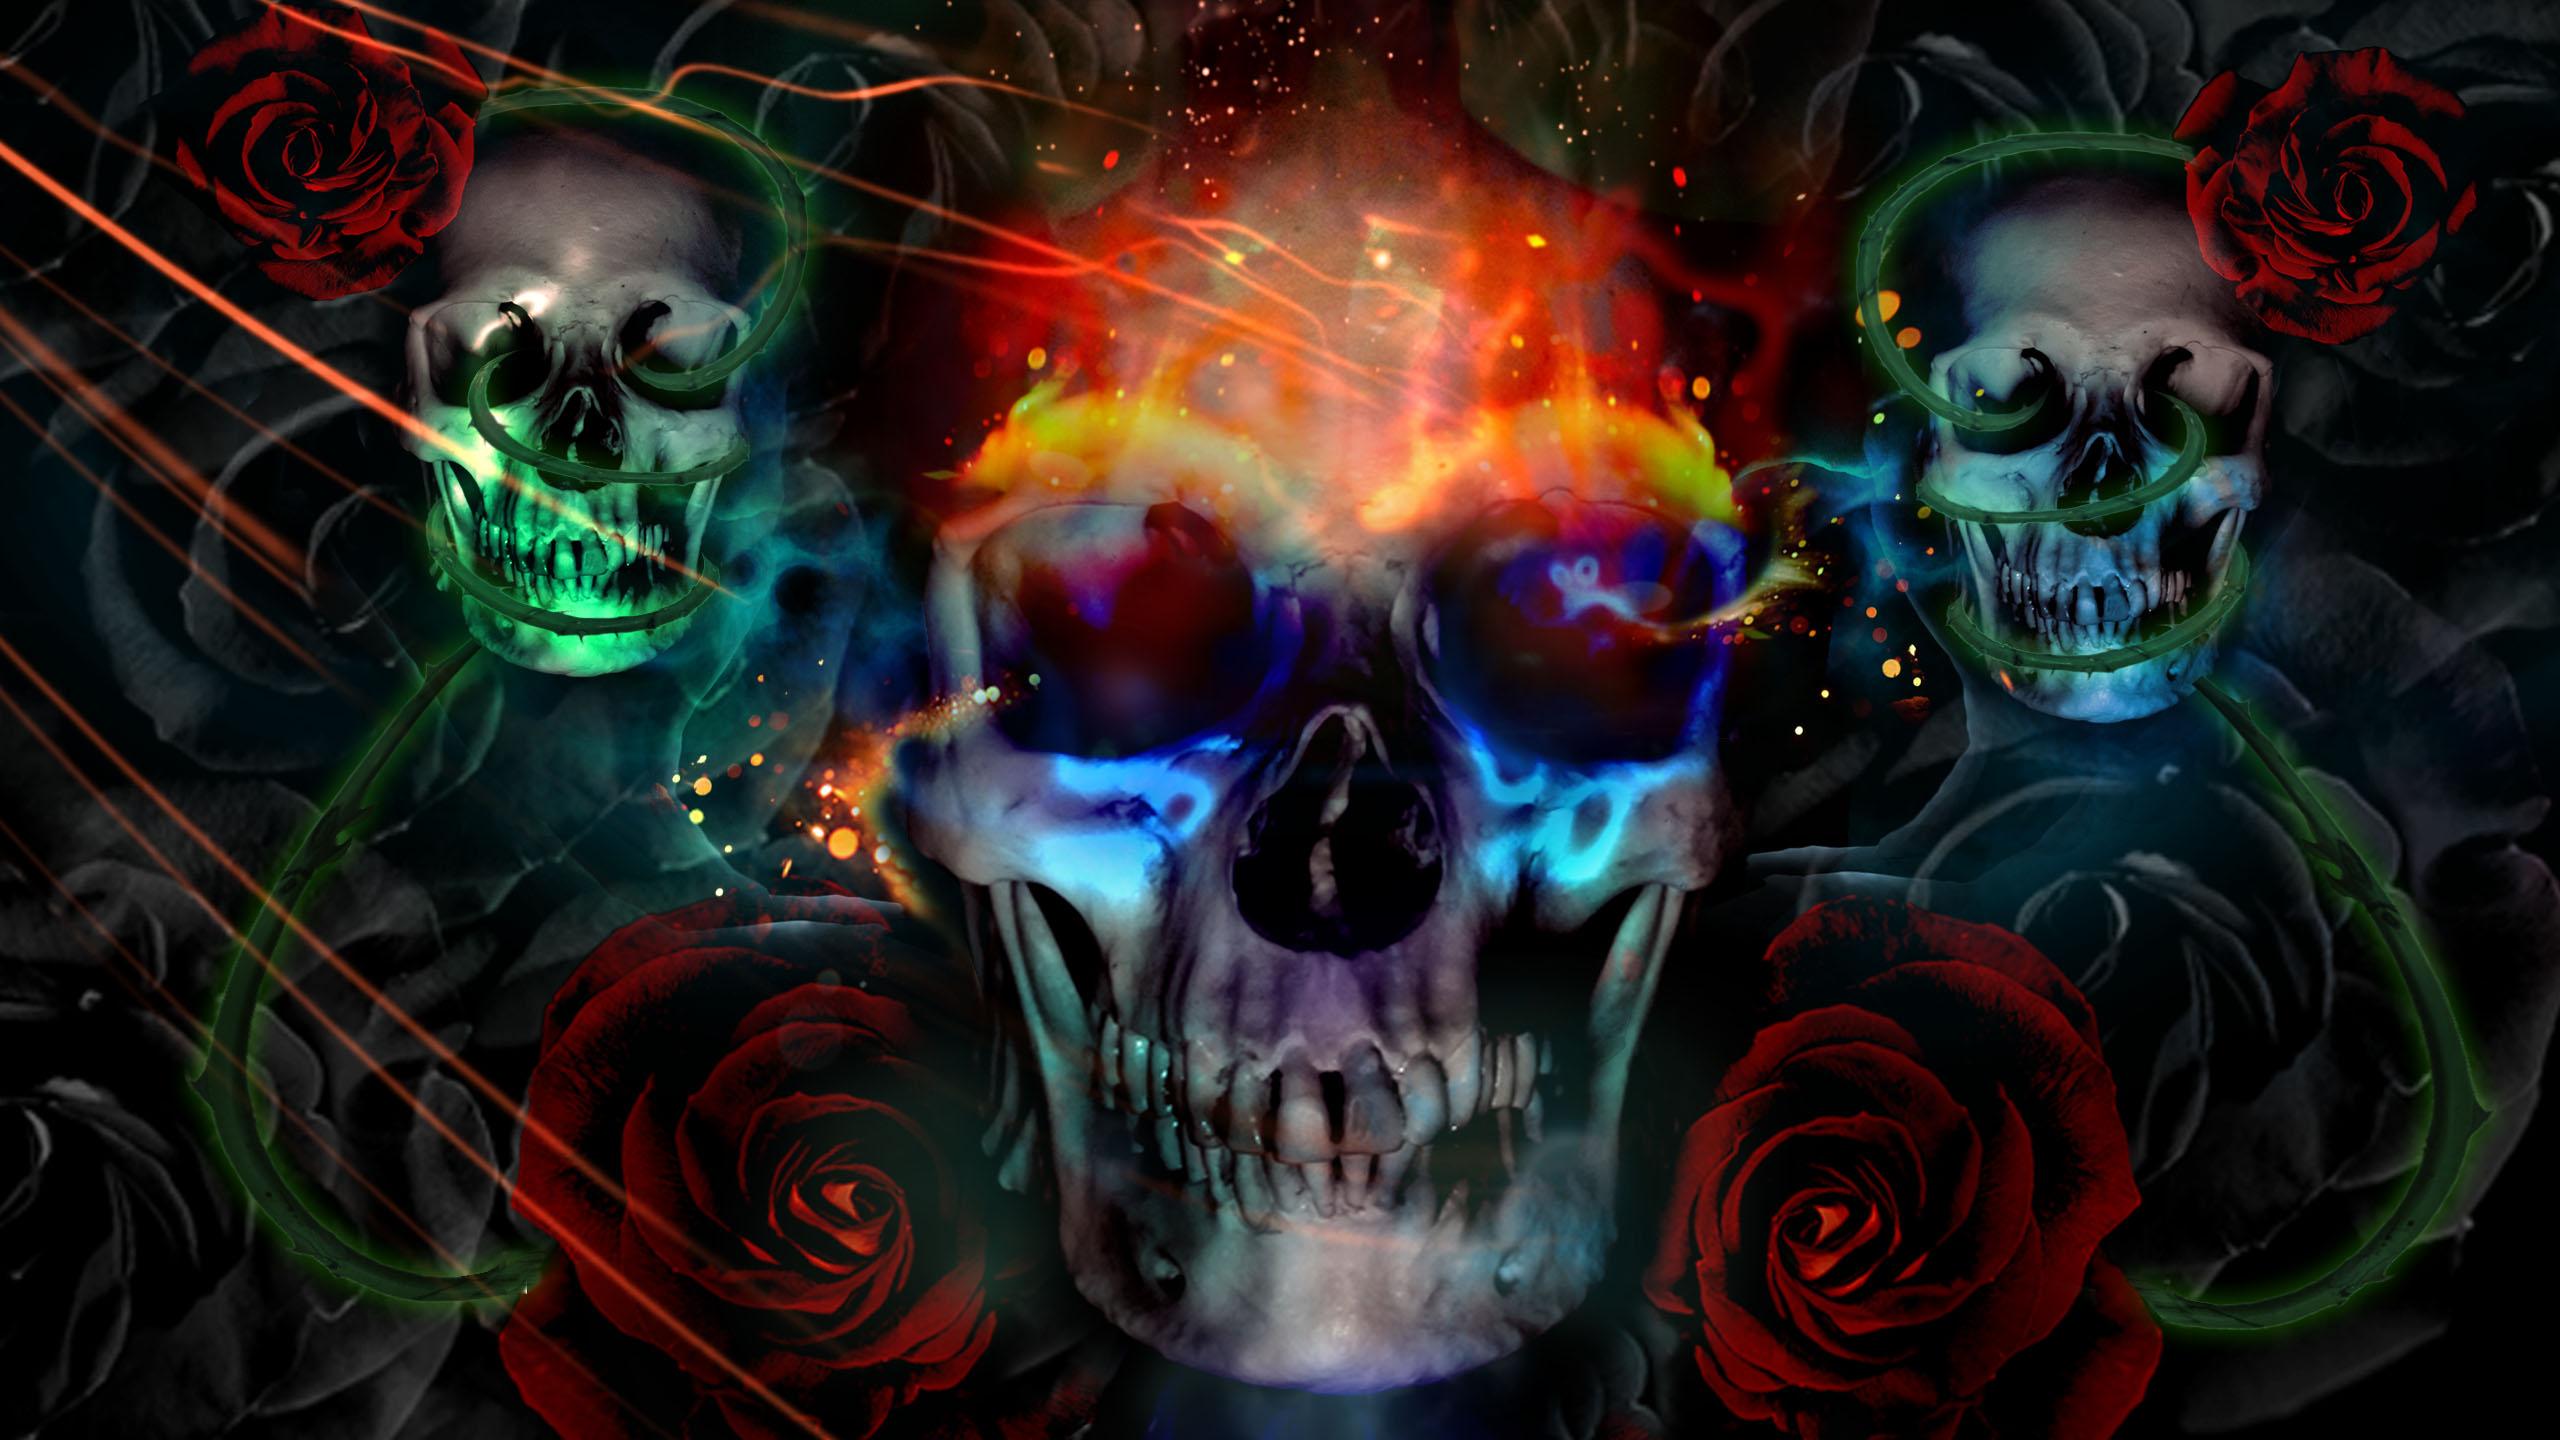 skulls desktop background wallpaper skulls desktop background hd 2560x1440